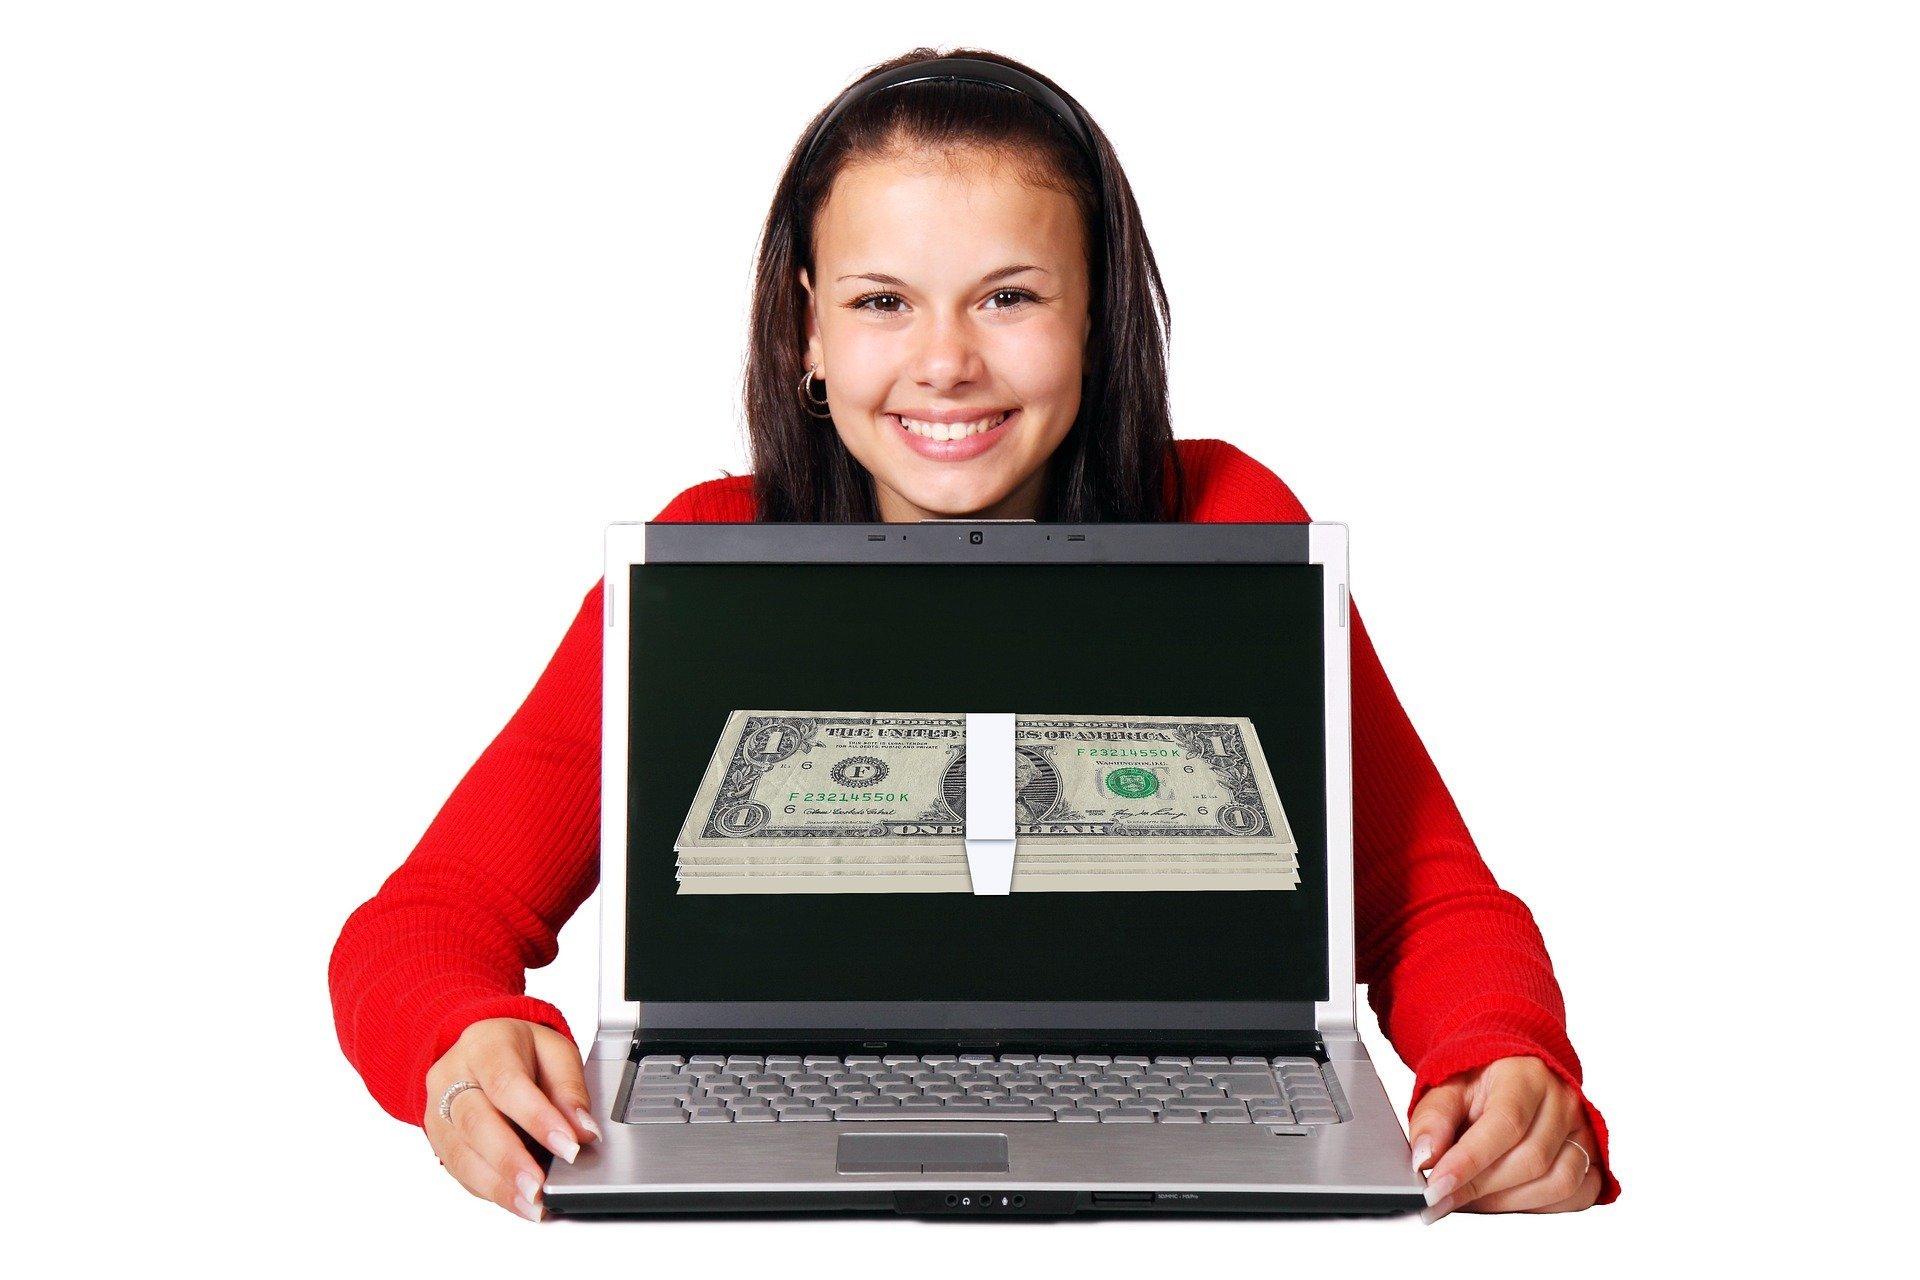 9 ways to make extra money online